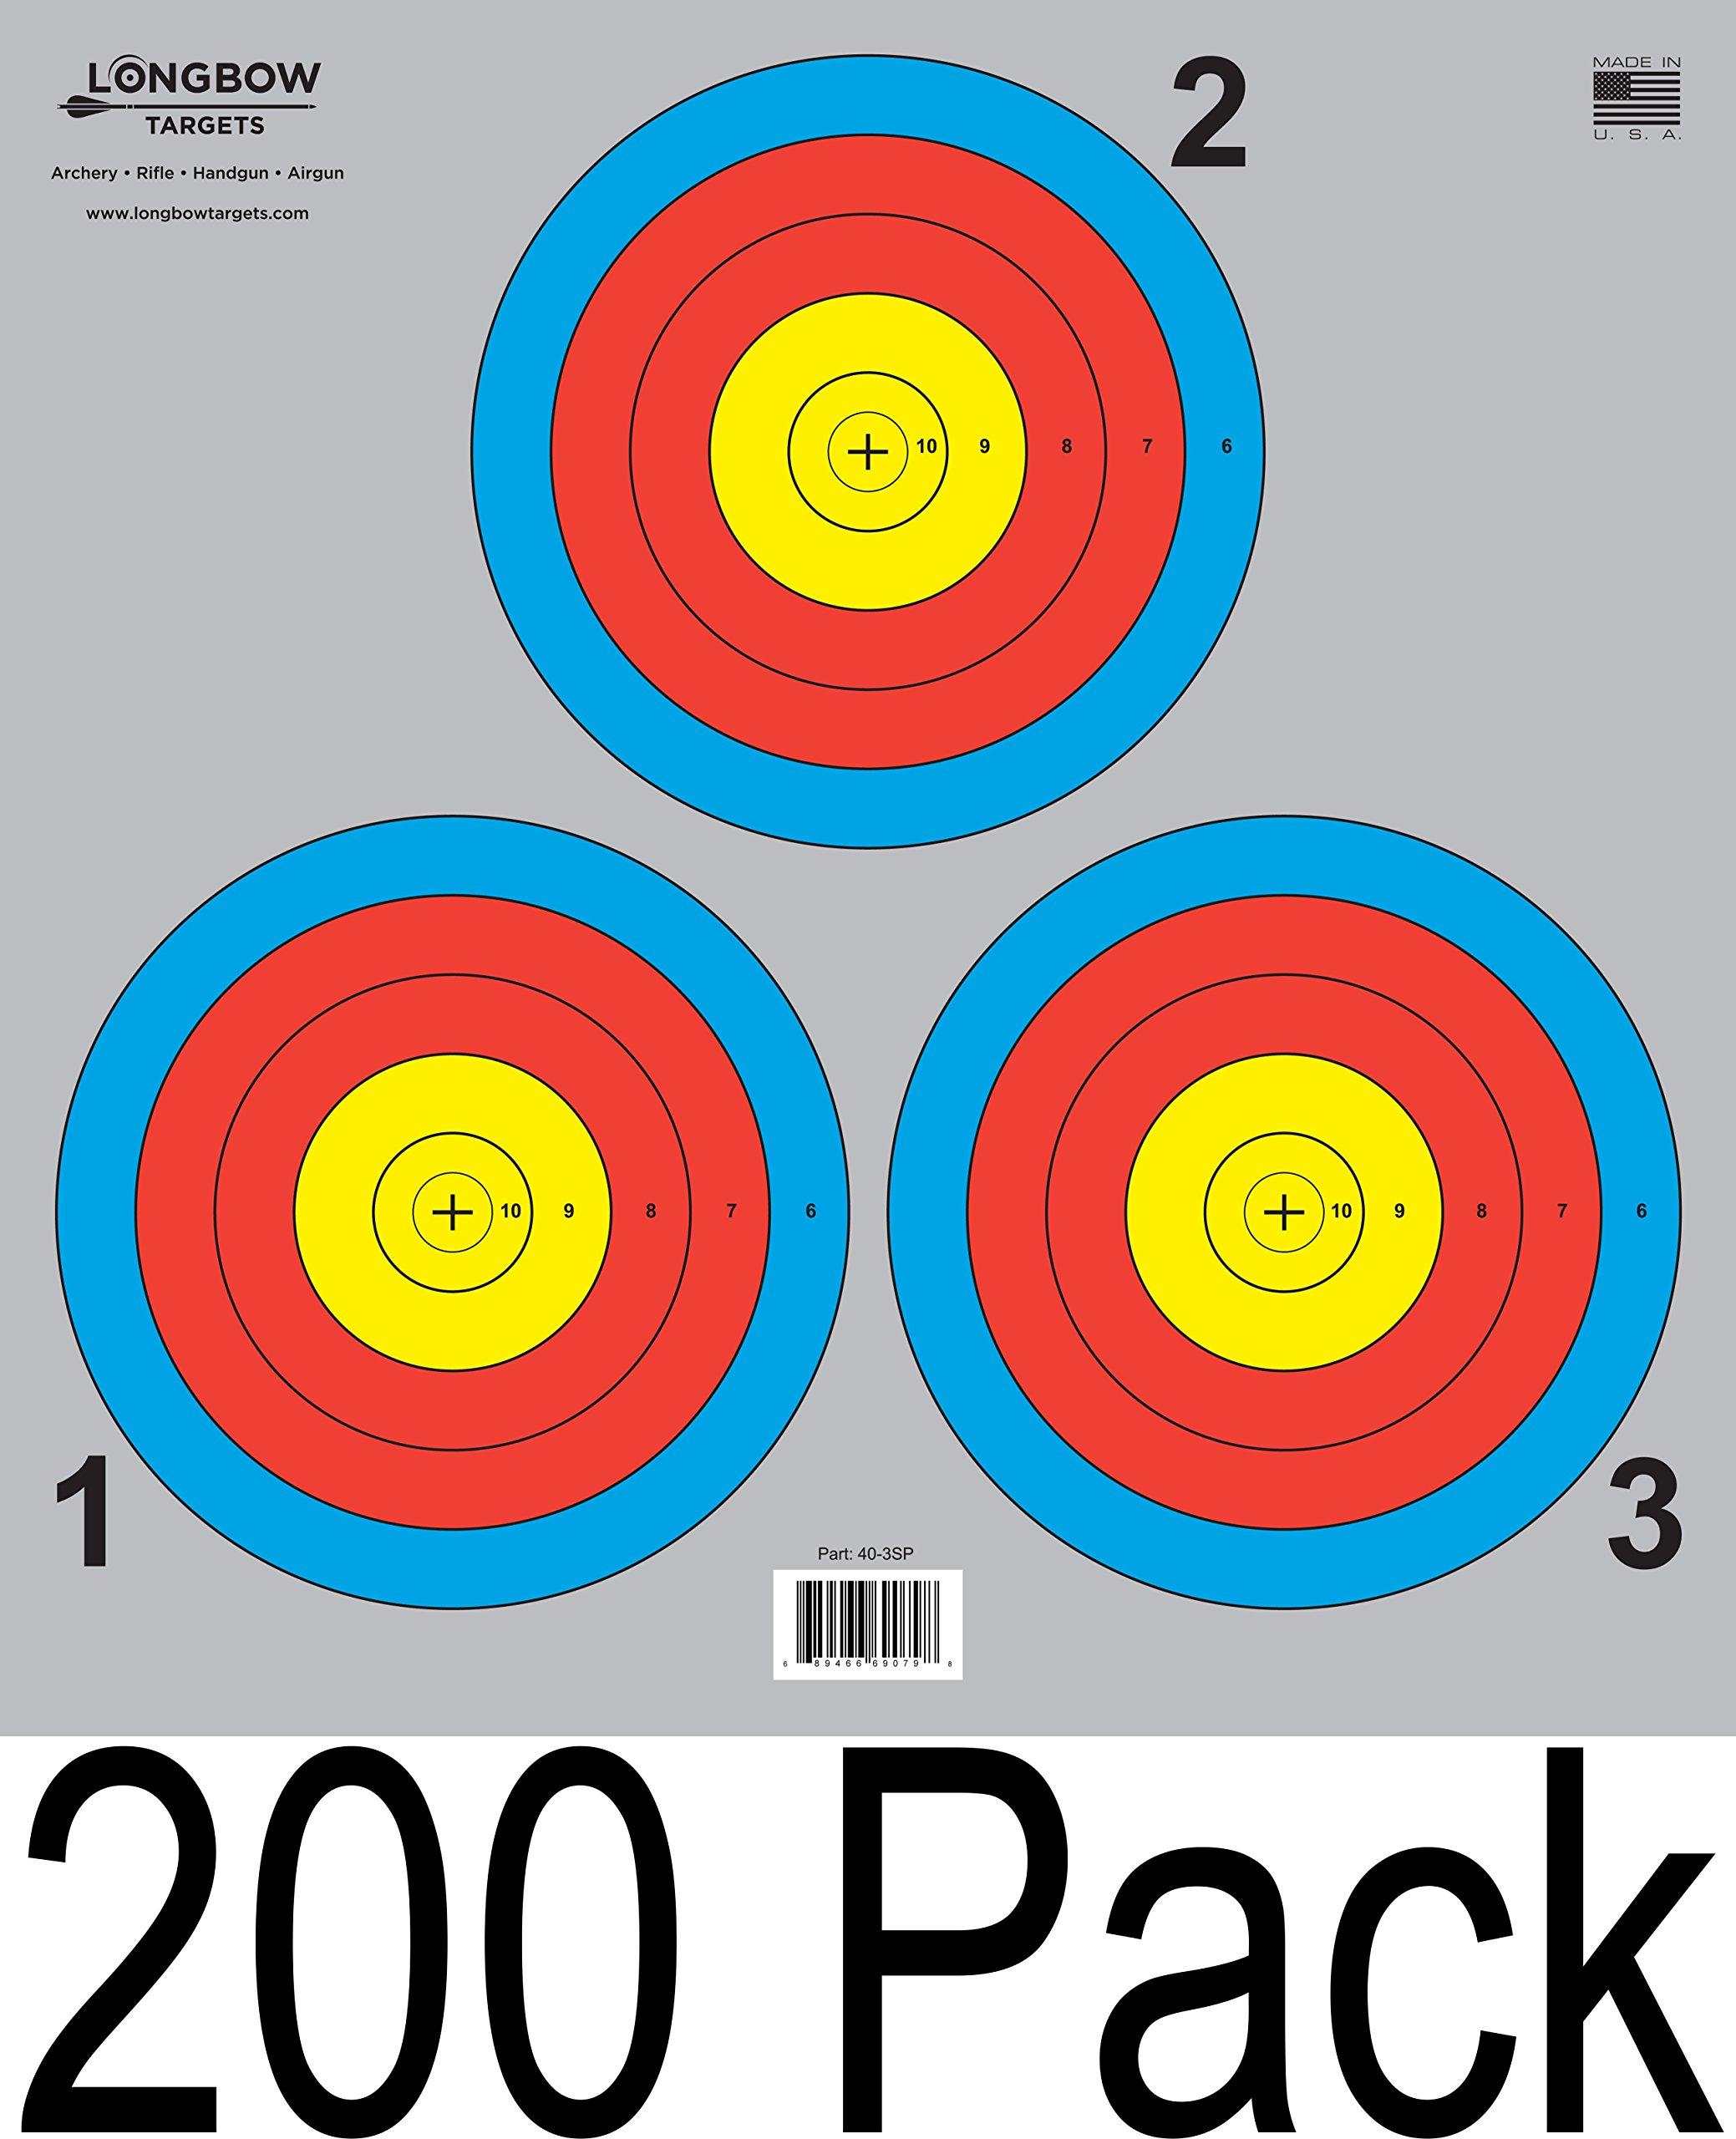 Archery 5 SPOT & 3 SPOT Vegas Targets by Longbow 8, 20, 50 & 200 Packs (3 Spot (200 Pack))